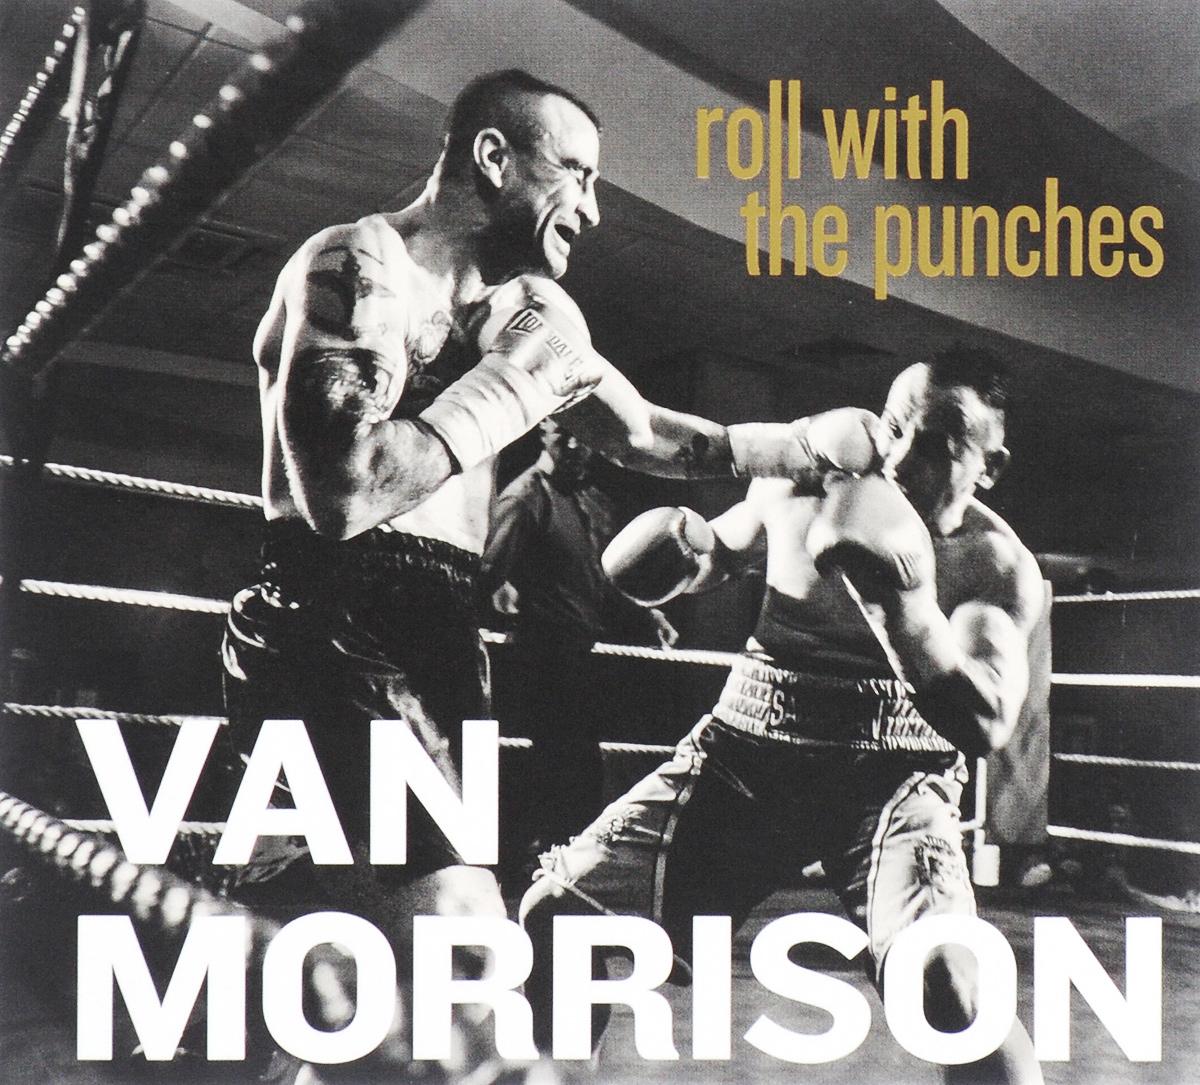 лучшая цена Ван Моррисон Van Morrison. Roll With The Punches